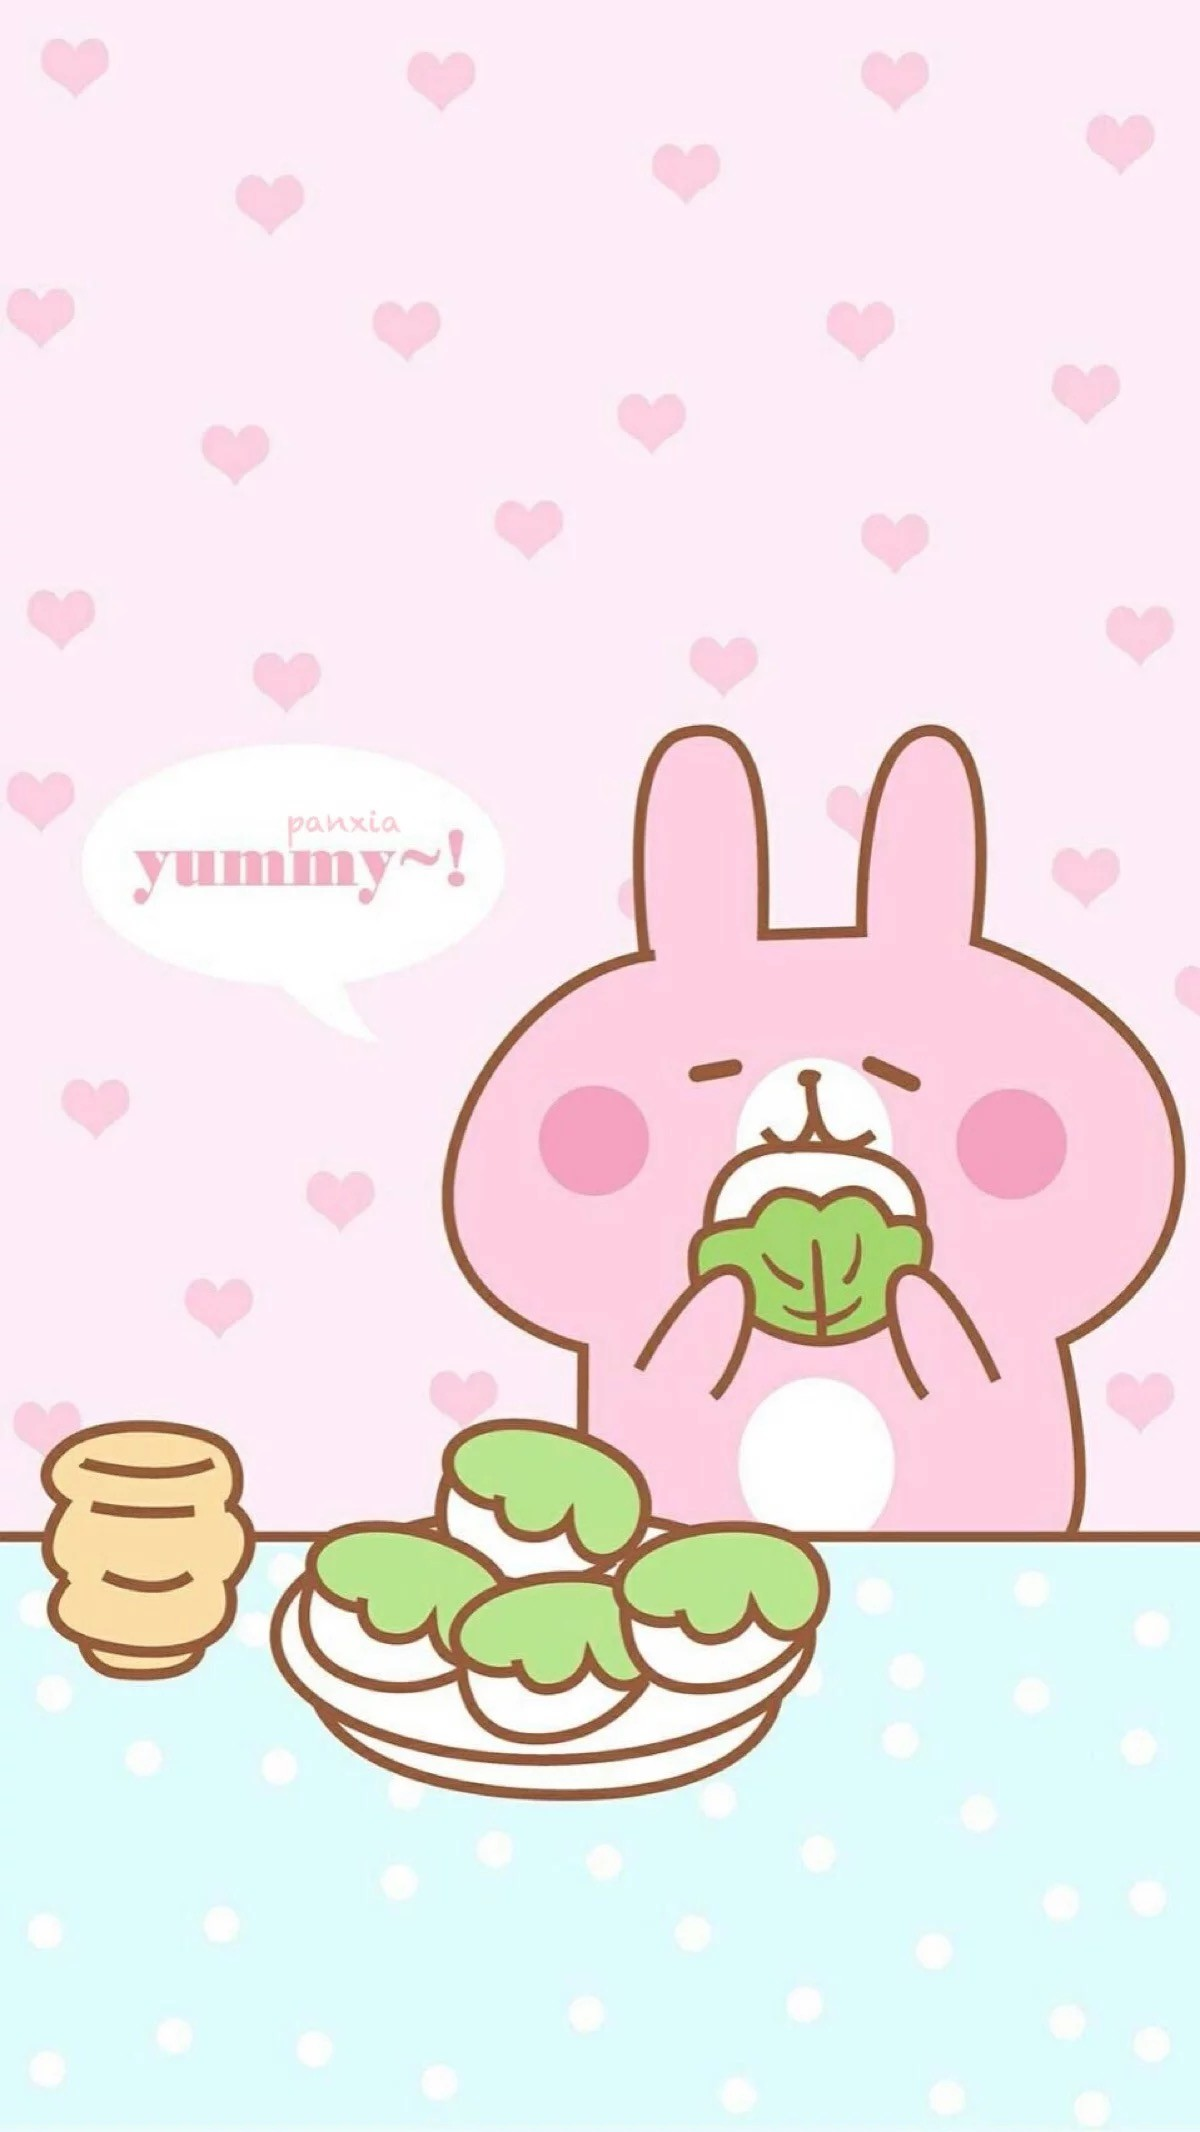 Cute Kawaii Wallpaper For Iphone 82 Images